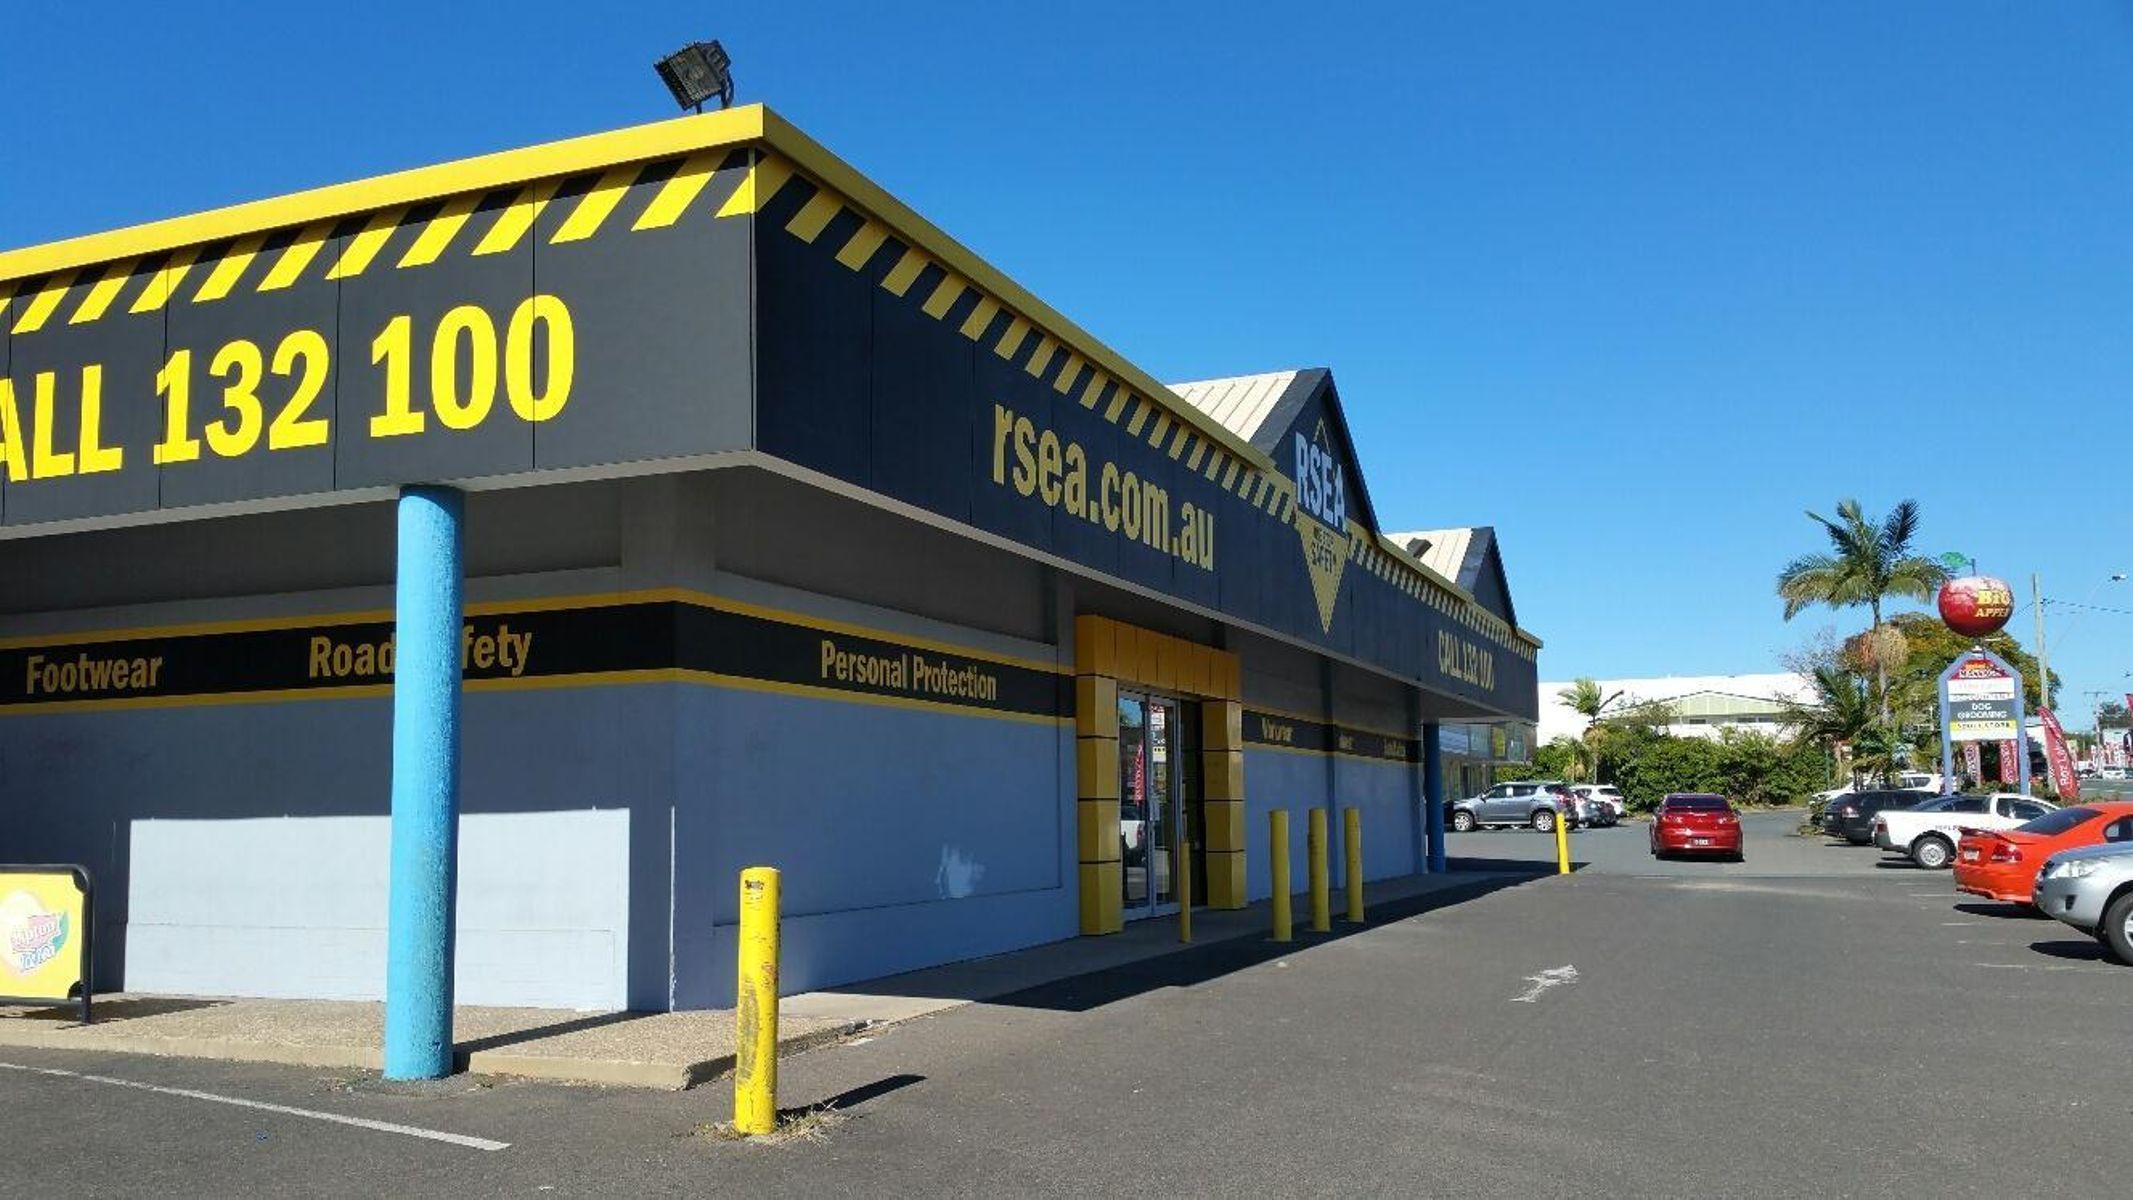 1102 Beaudesert Road, Acacia Ridge, QLD 4110